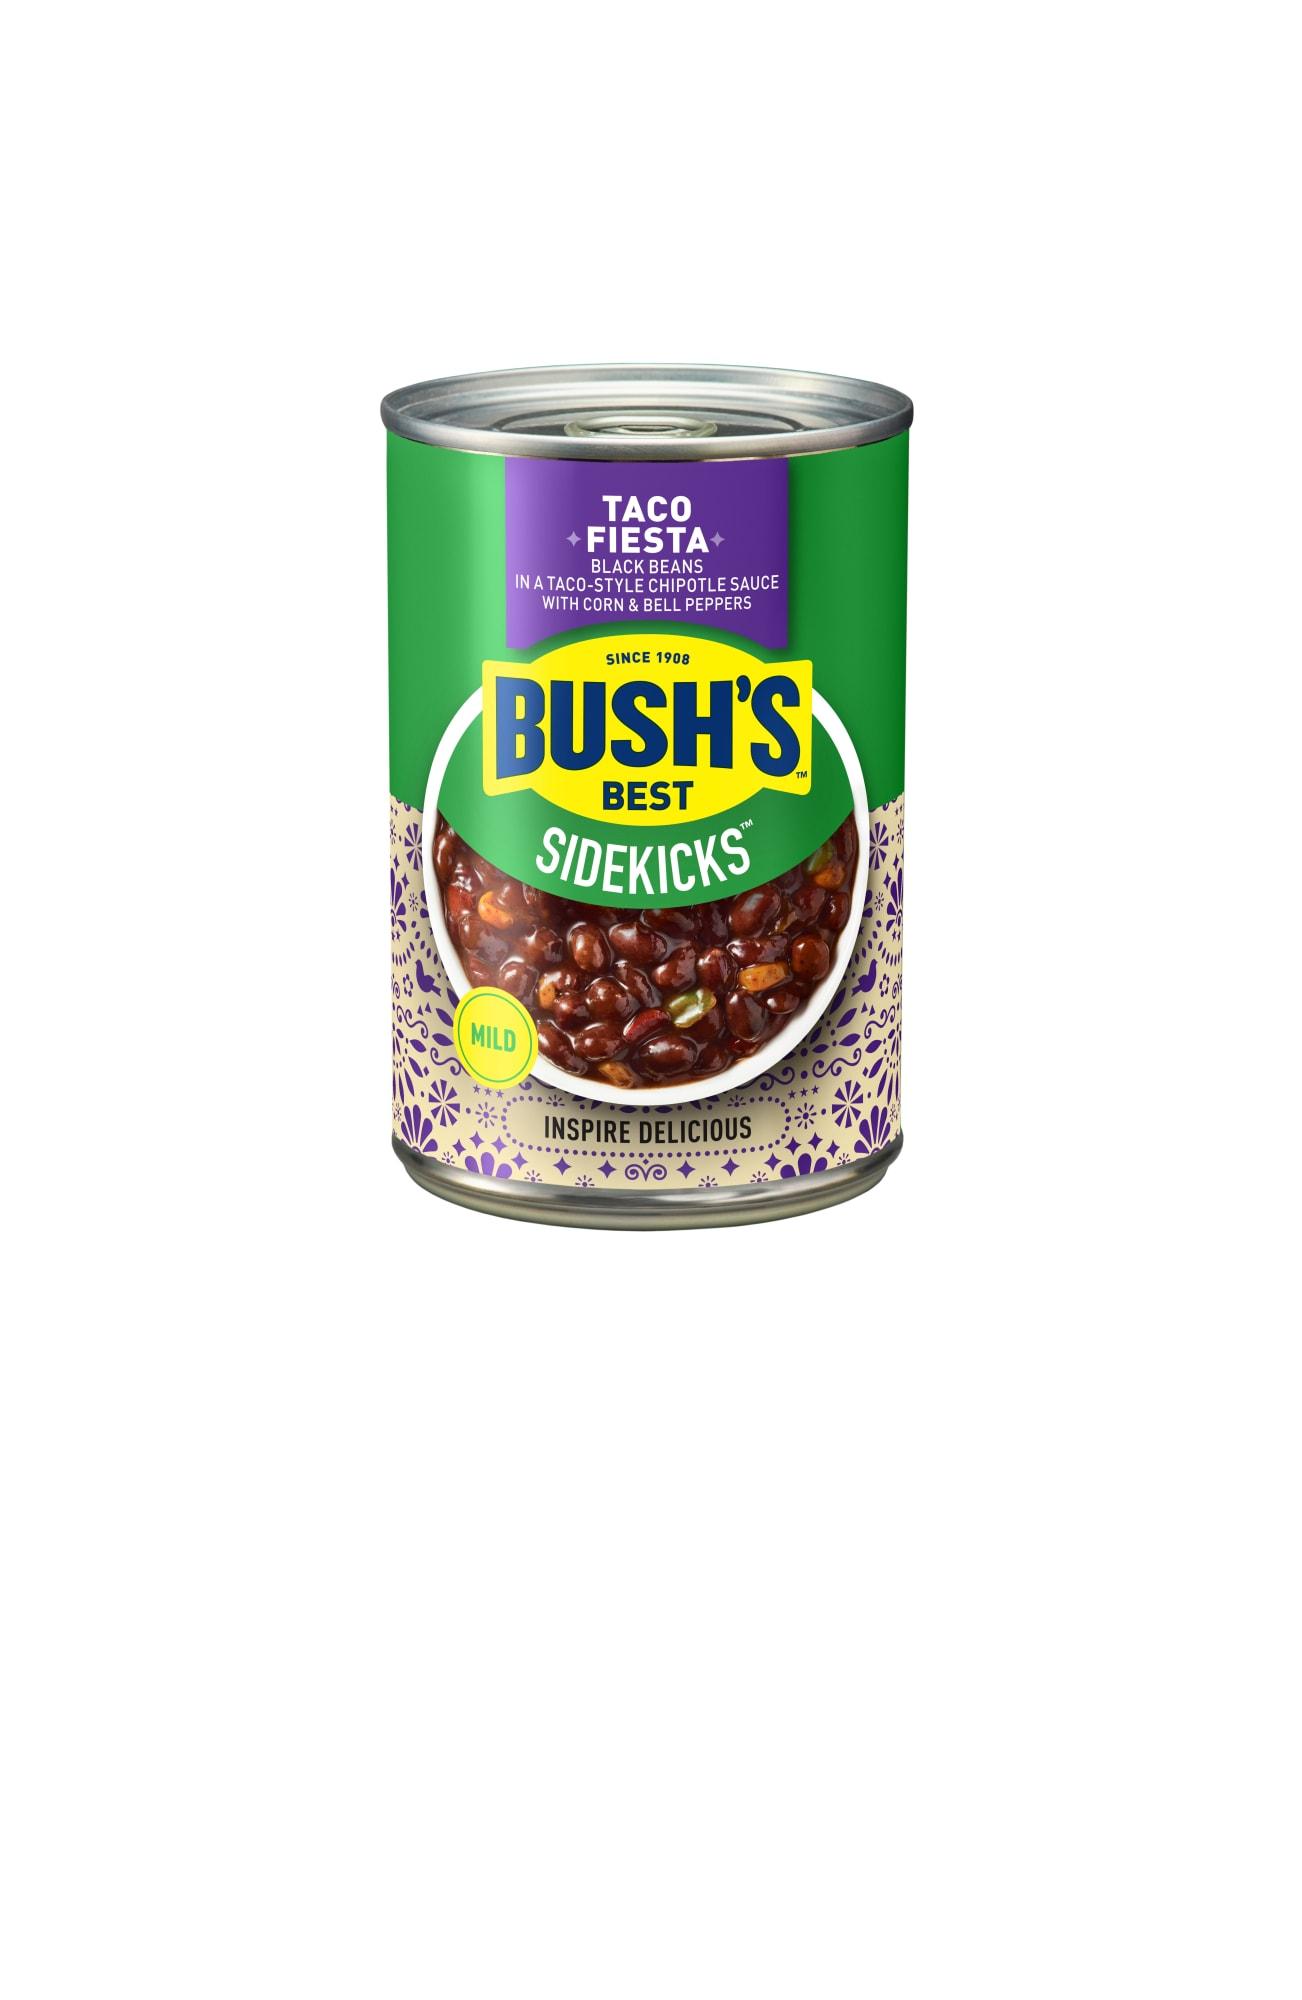 Transform favorite recipes with zesty Bush's Beans Sidekicks